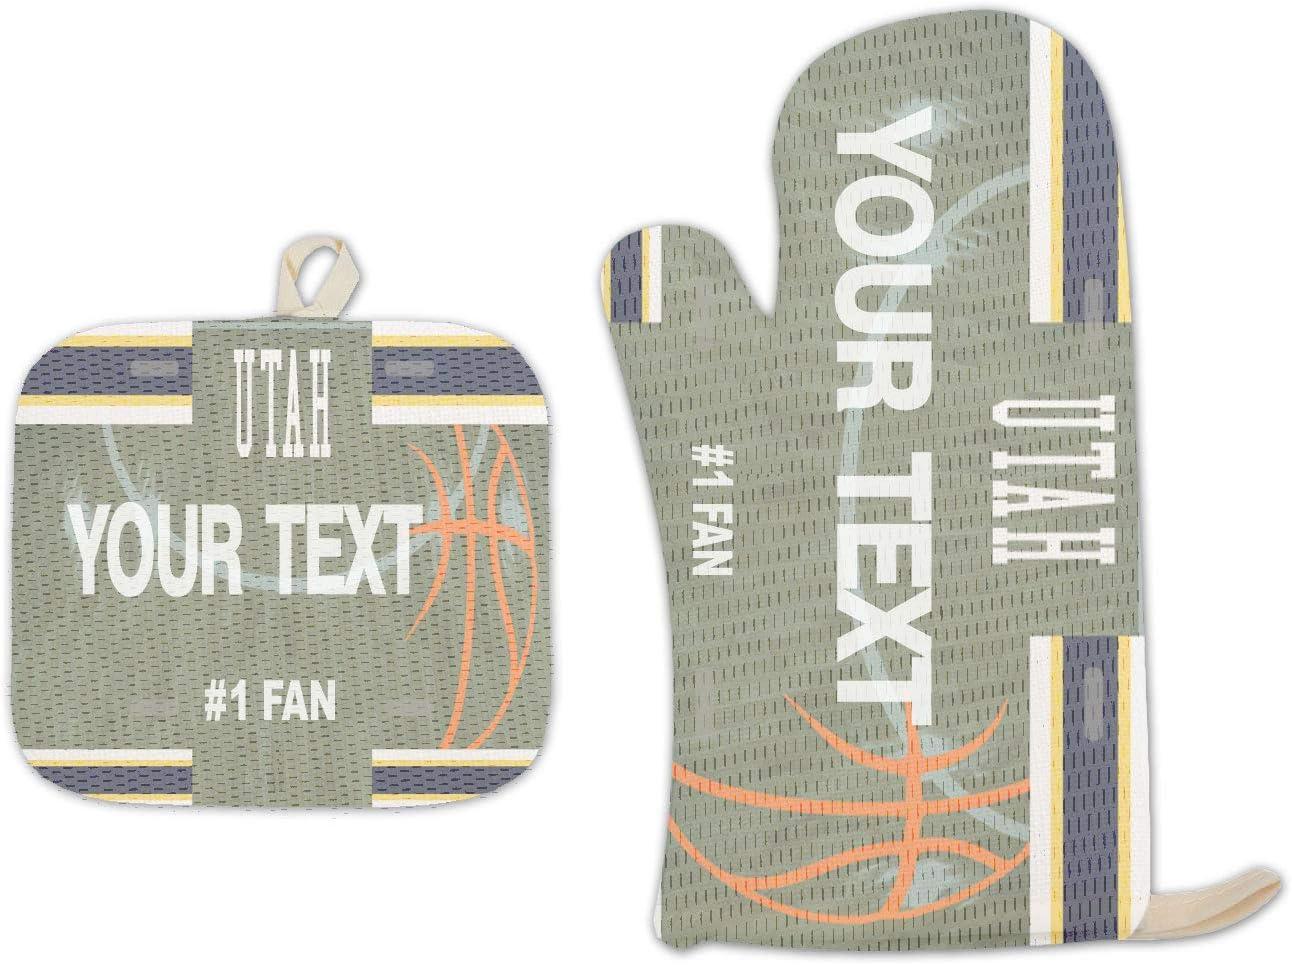 Bleu Reign BRGiftShop Personalized Custom Name Basketball Team Utah Linen Oven Mitt and Potholder Set